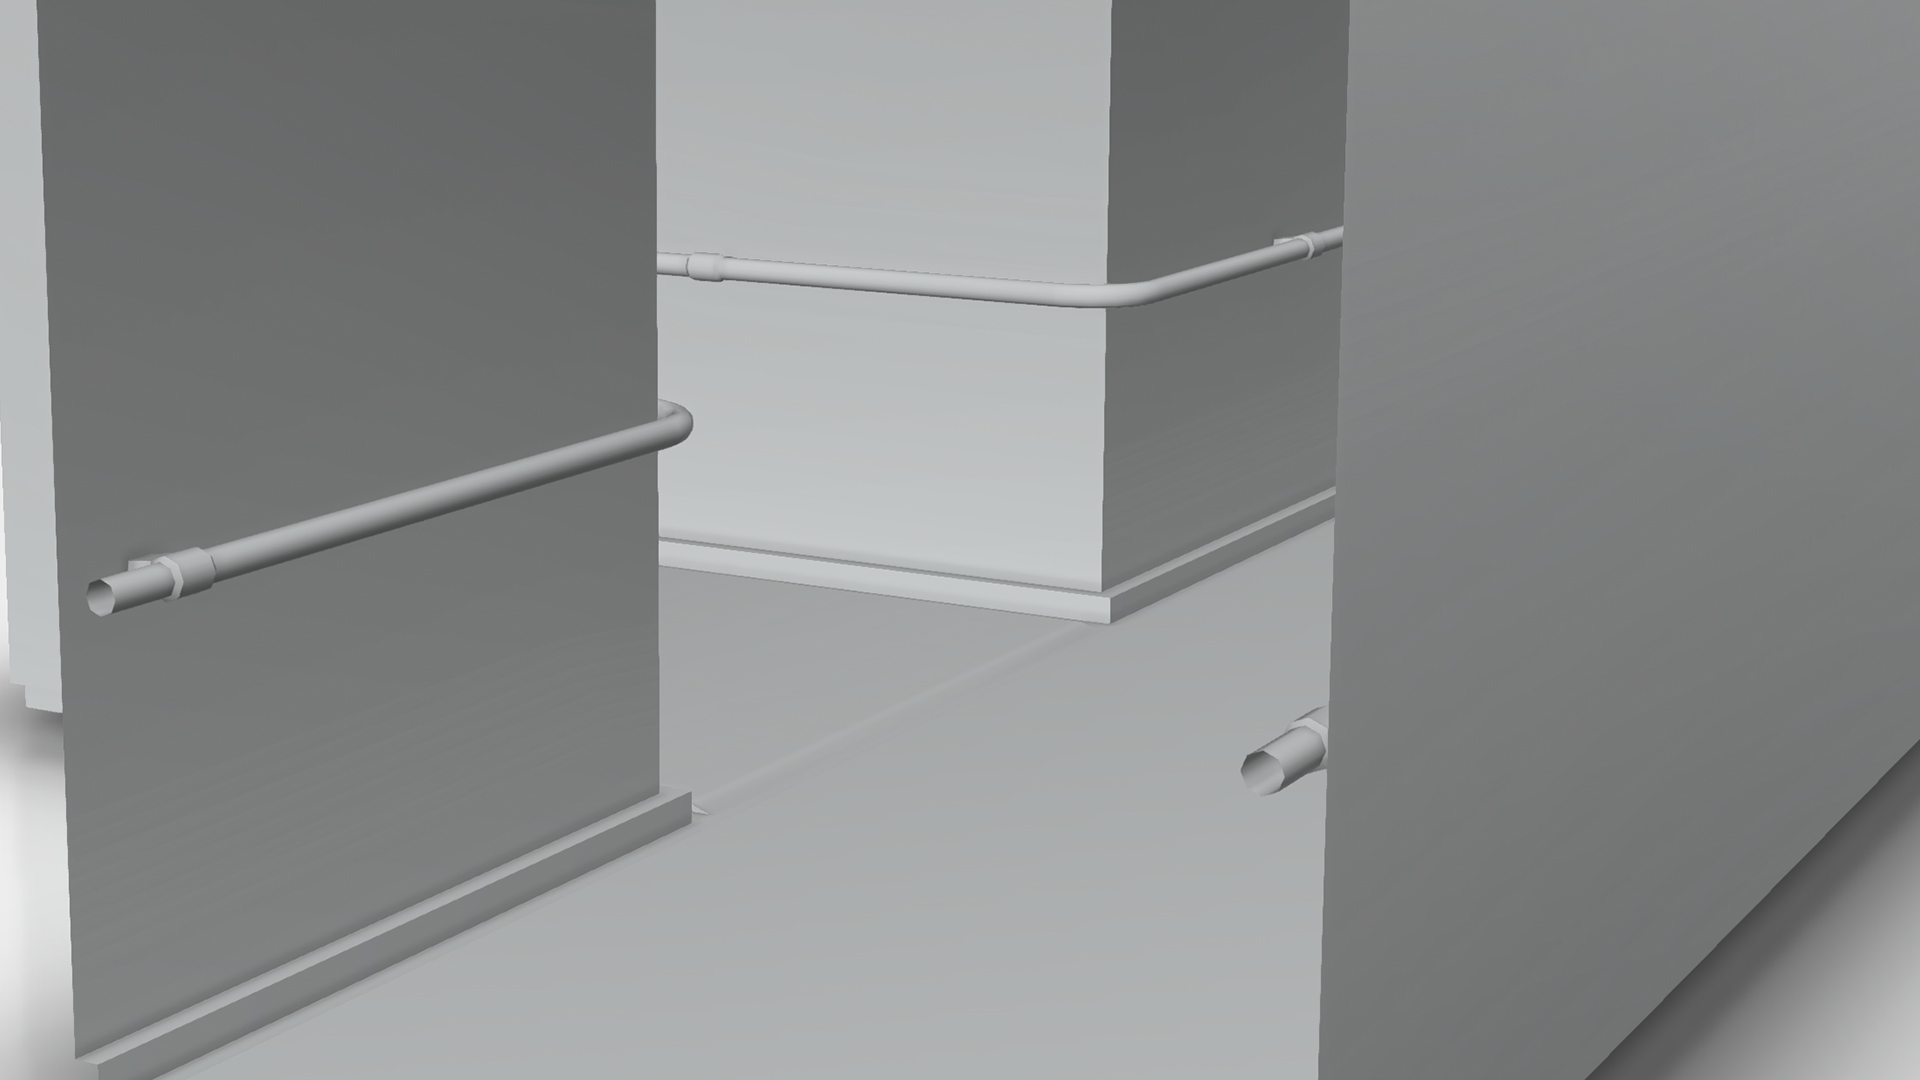 unity 3d level design